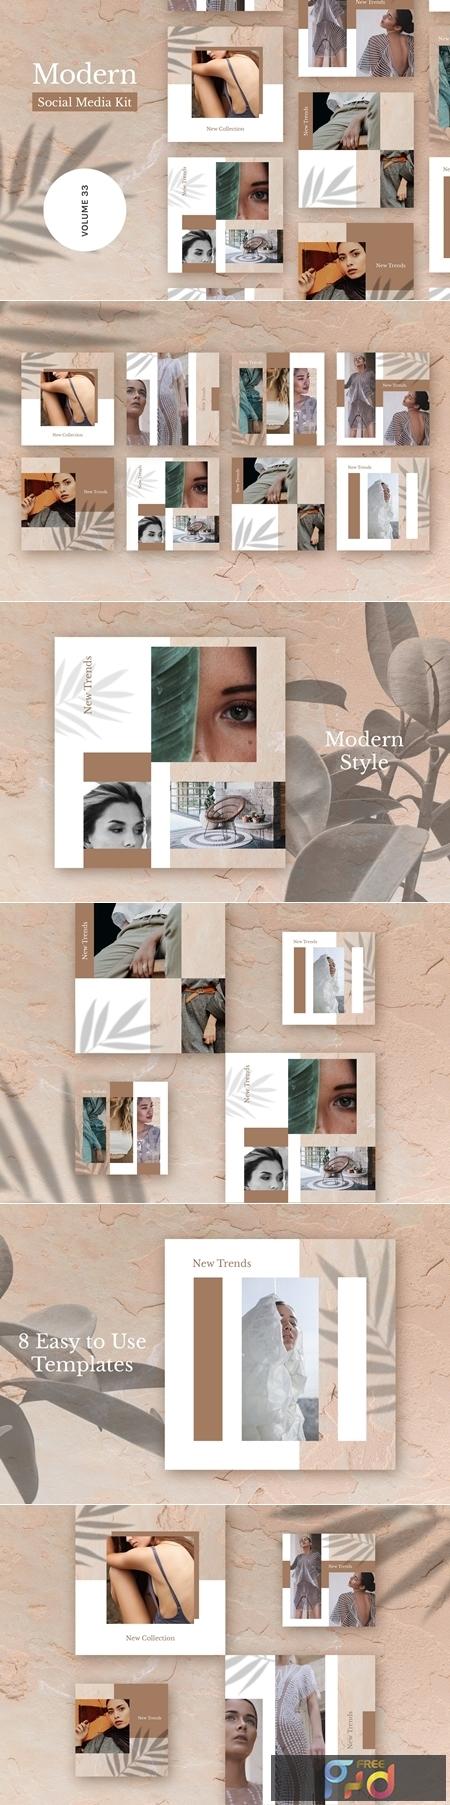 Modern Social Media Kit (Vol. 32) 4082526 1